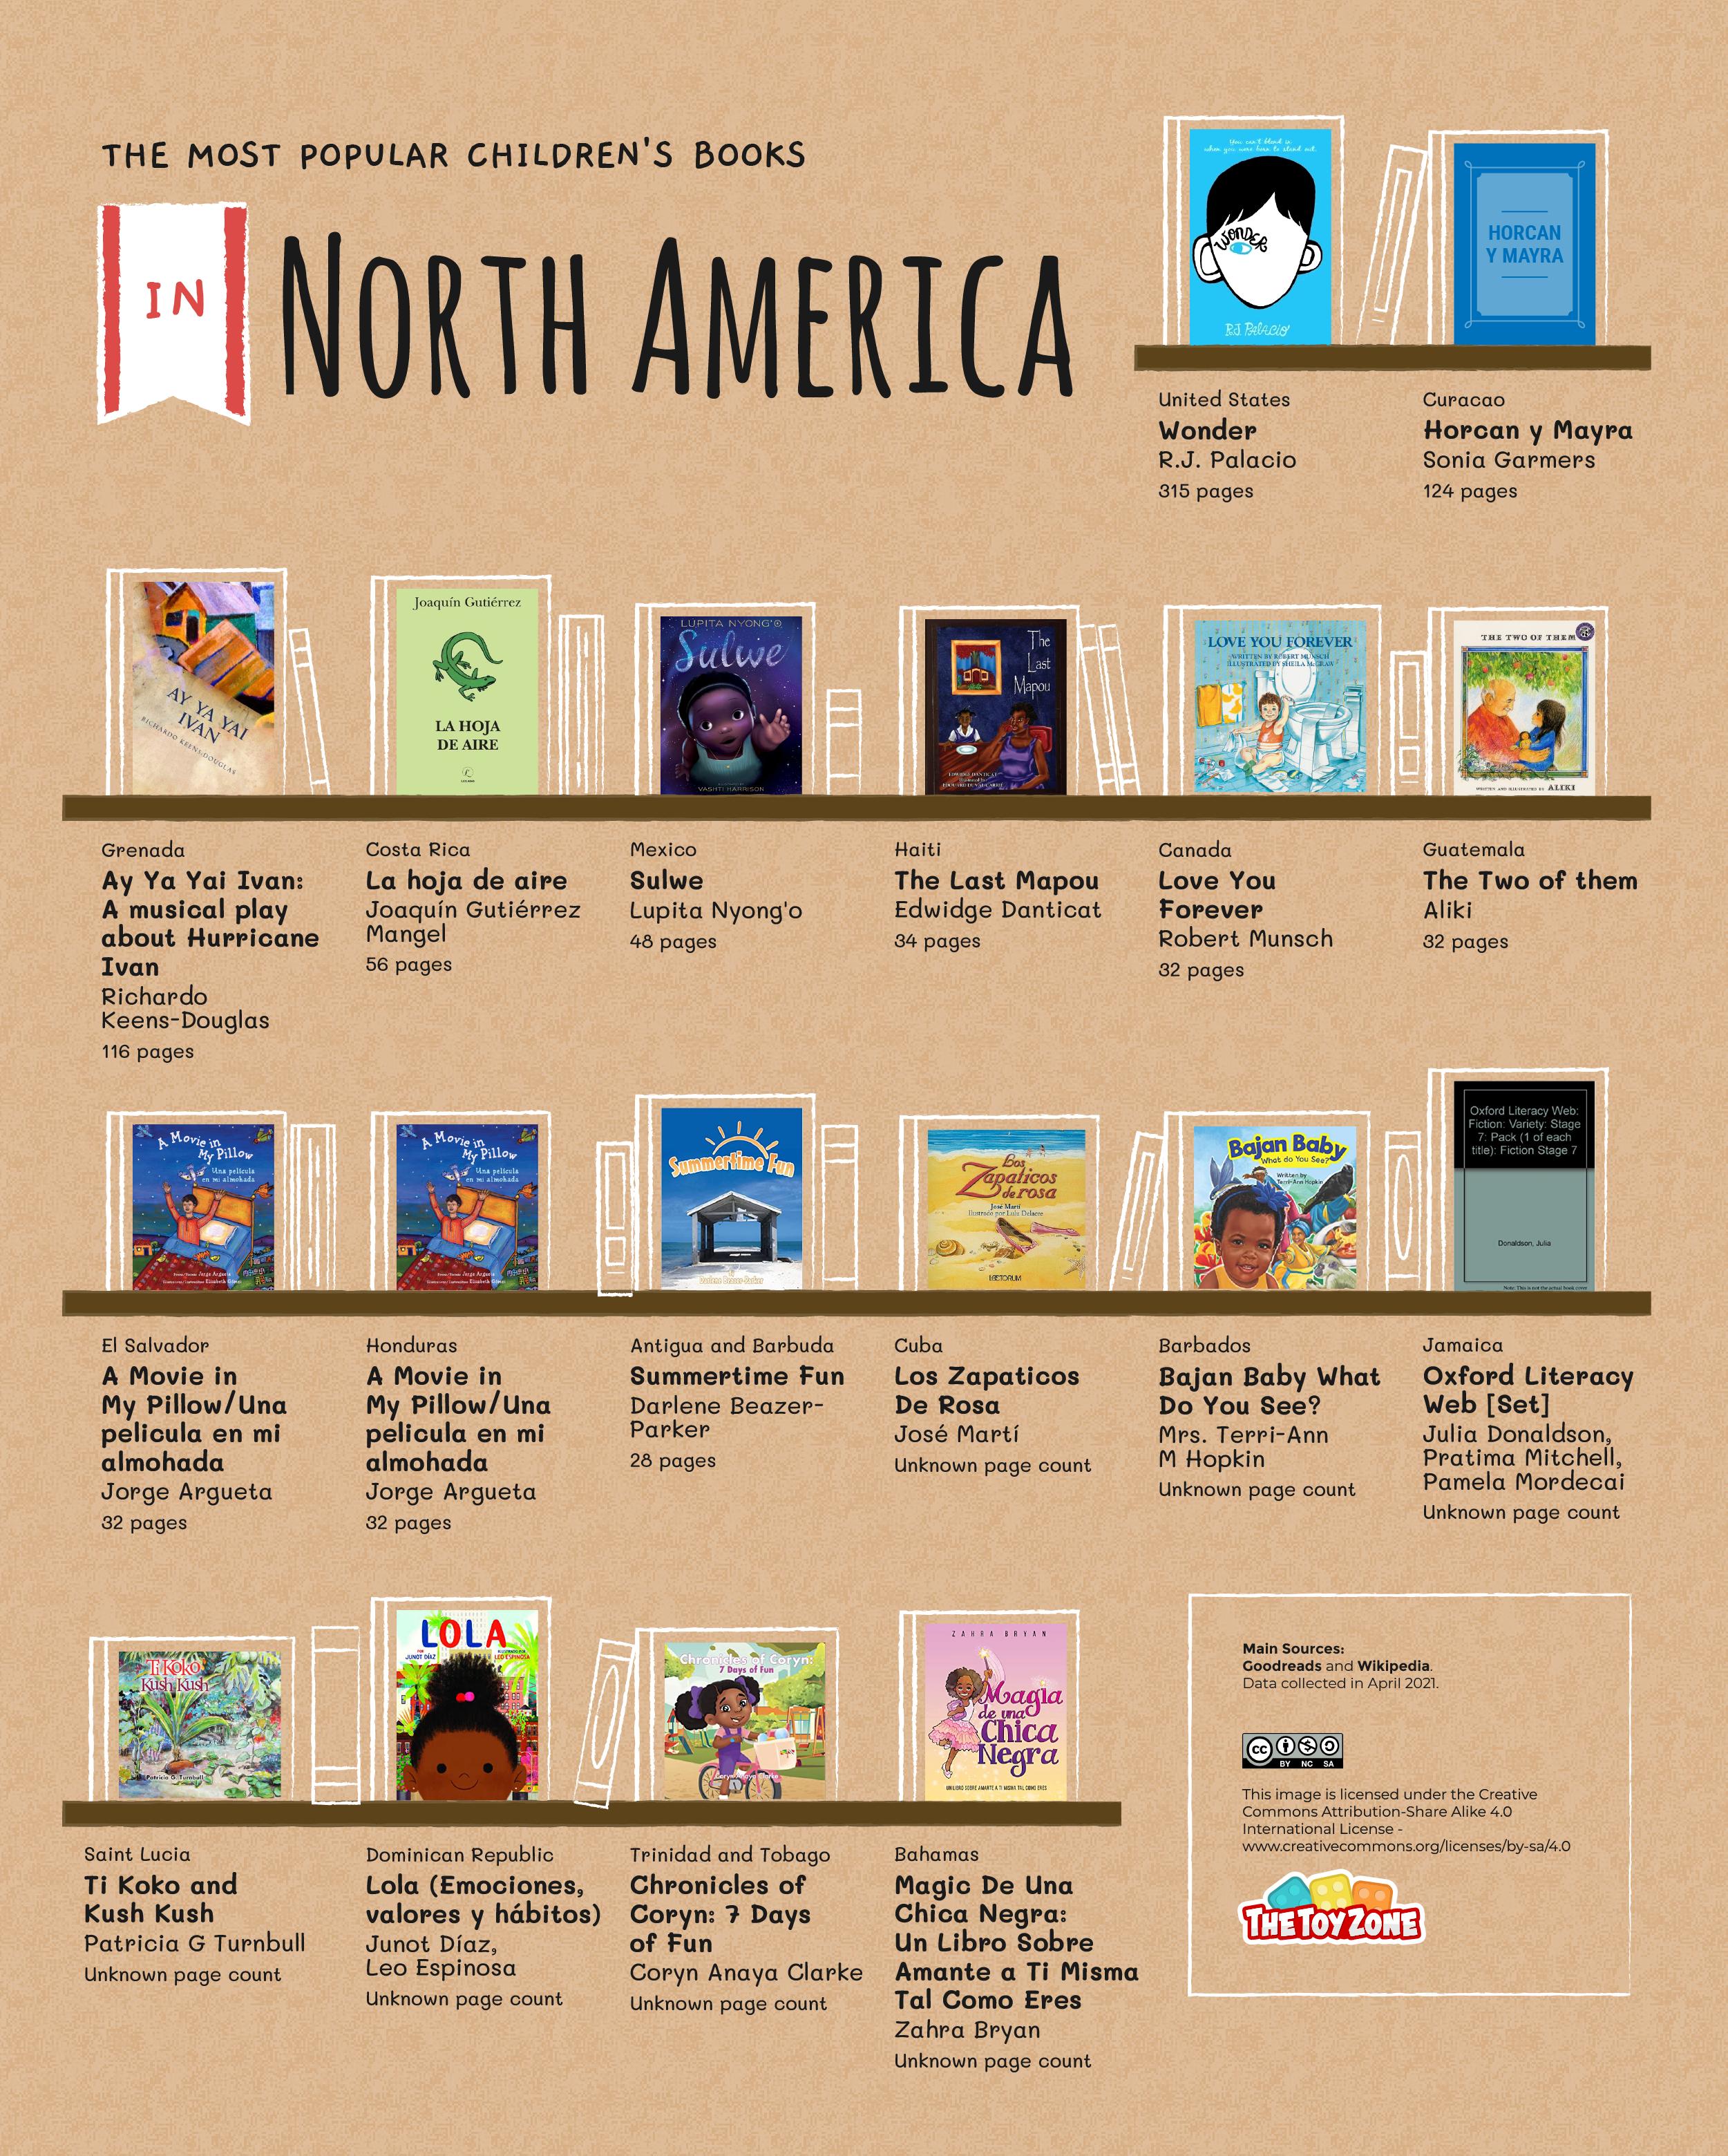 Bookshelf graphic of most popular children's books in North America